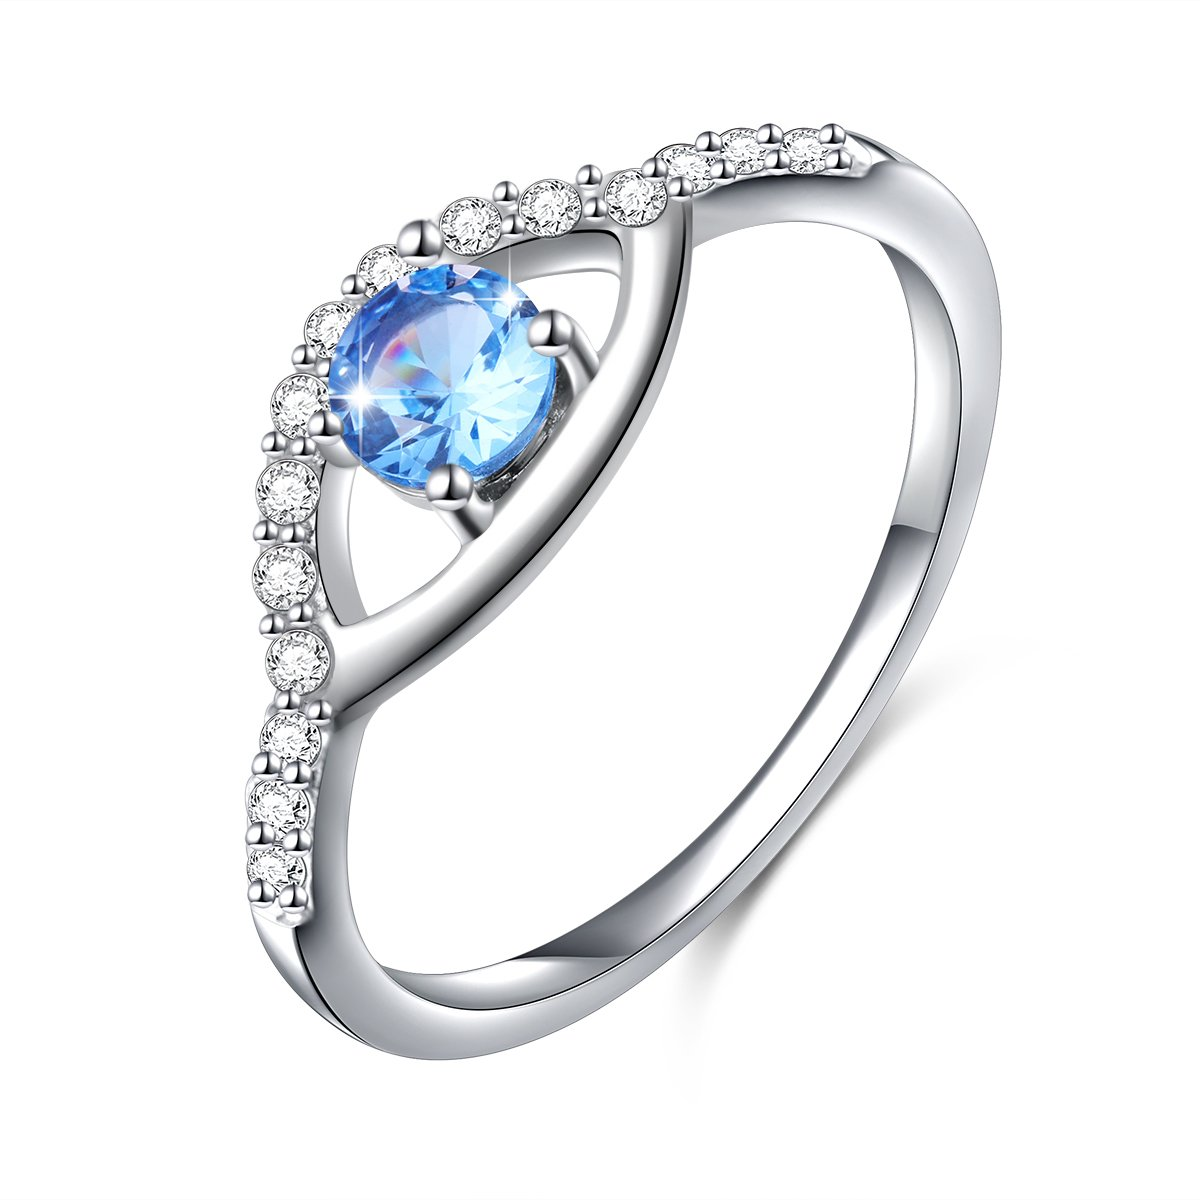 SILVER MOUNTAIN Turkey Jewelry 925 Sterling Silver Blue Evil Eye Ring for Women Size 7